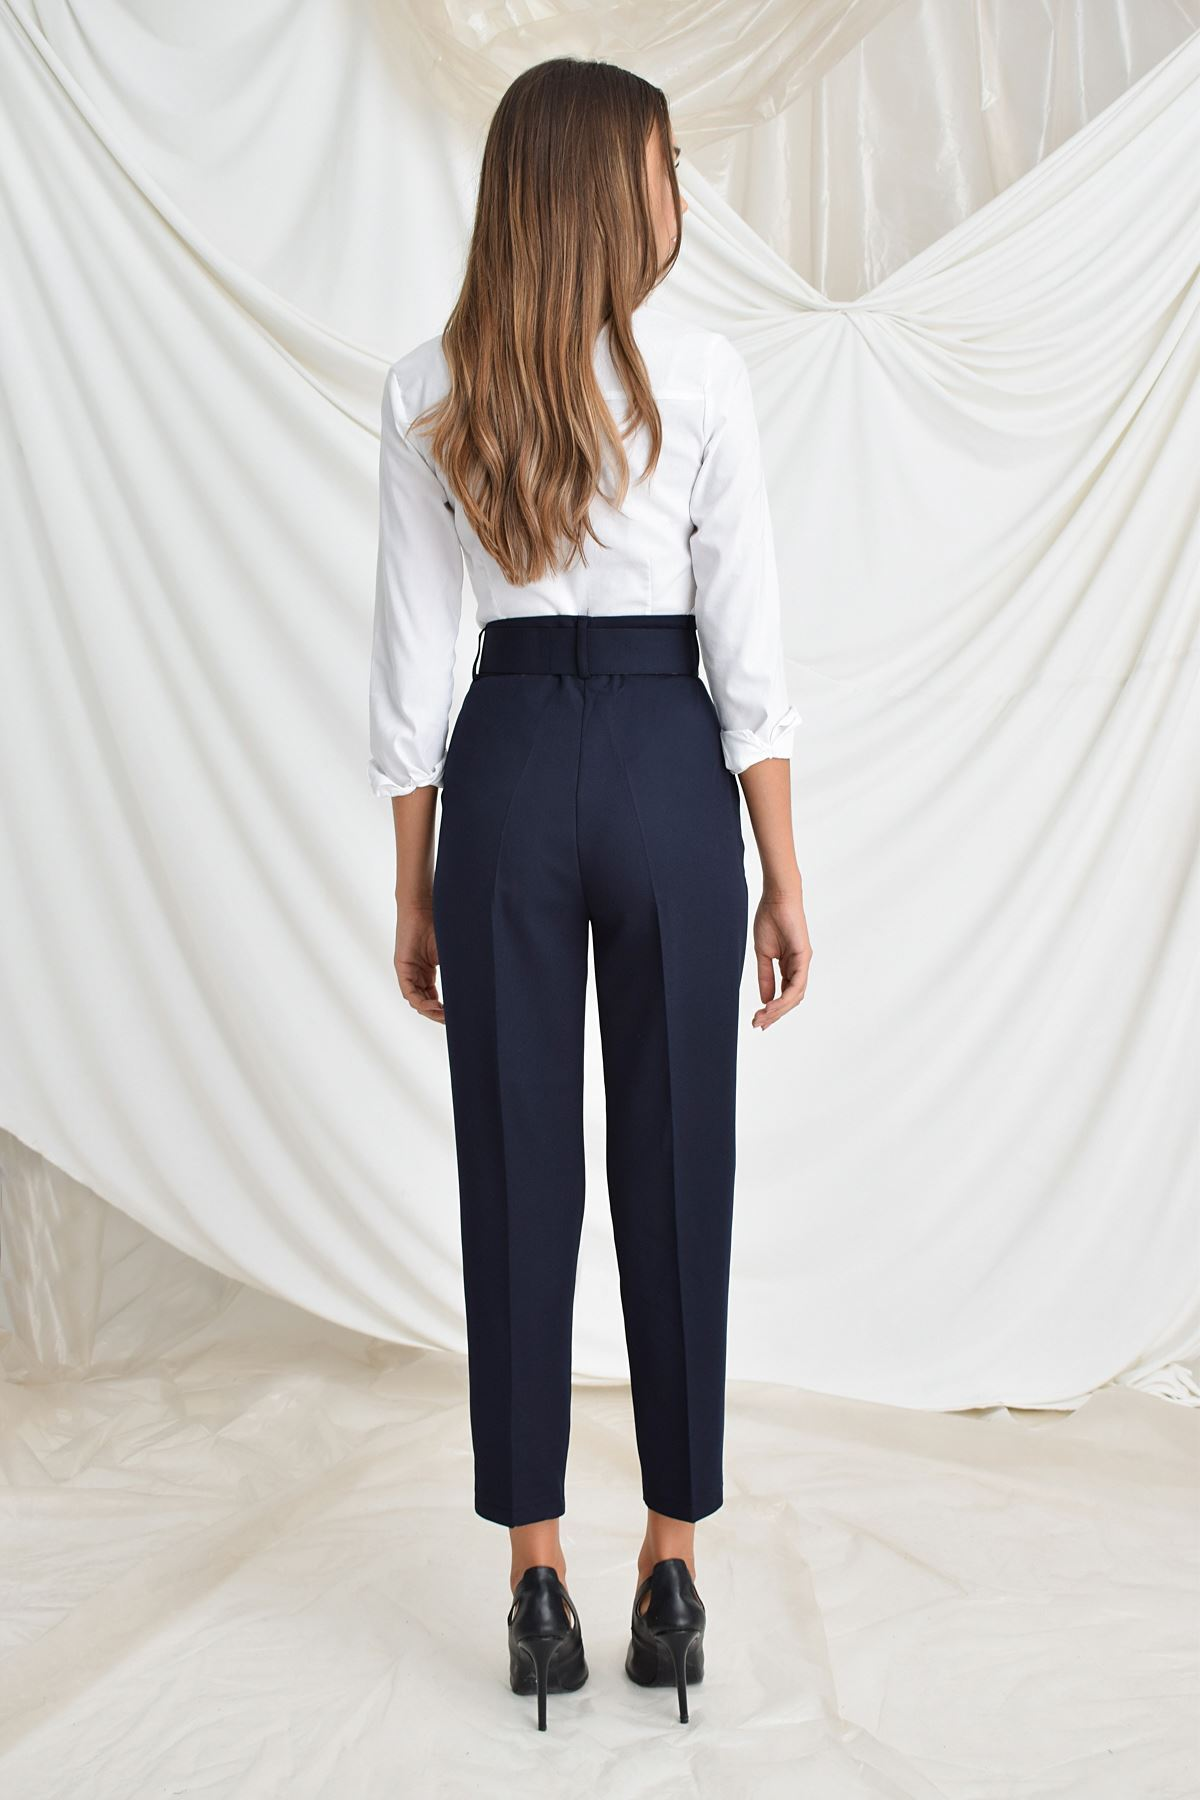 Beli Kemerli Havuç Pantolon